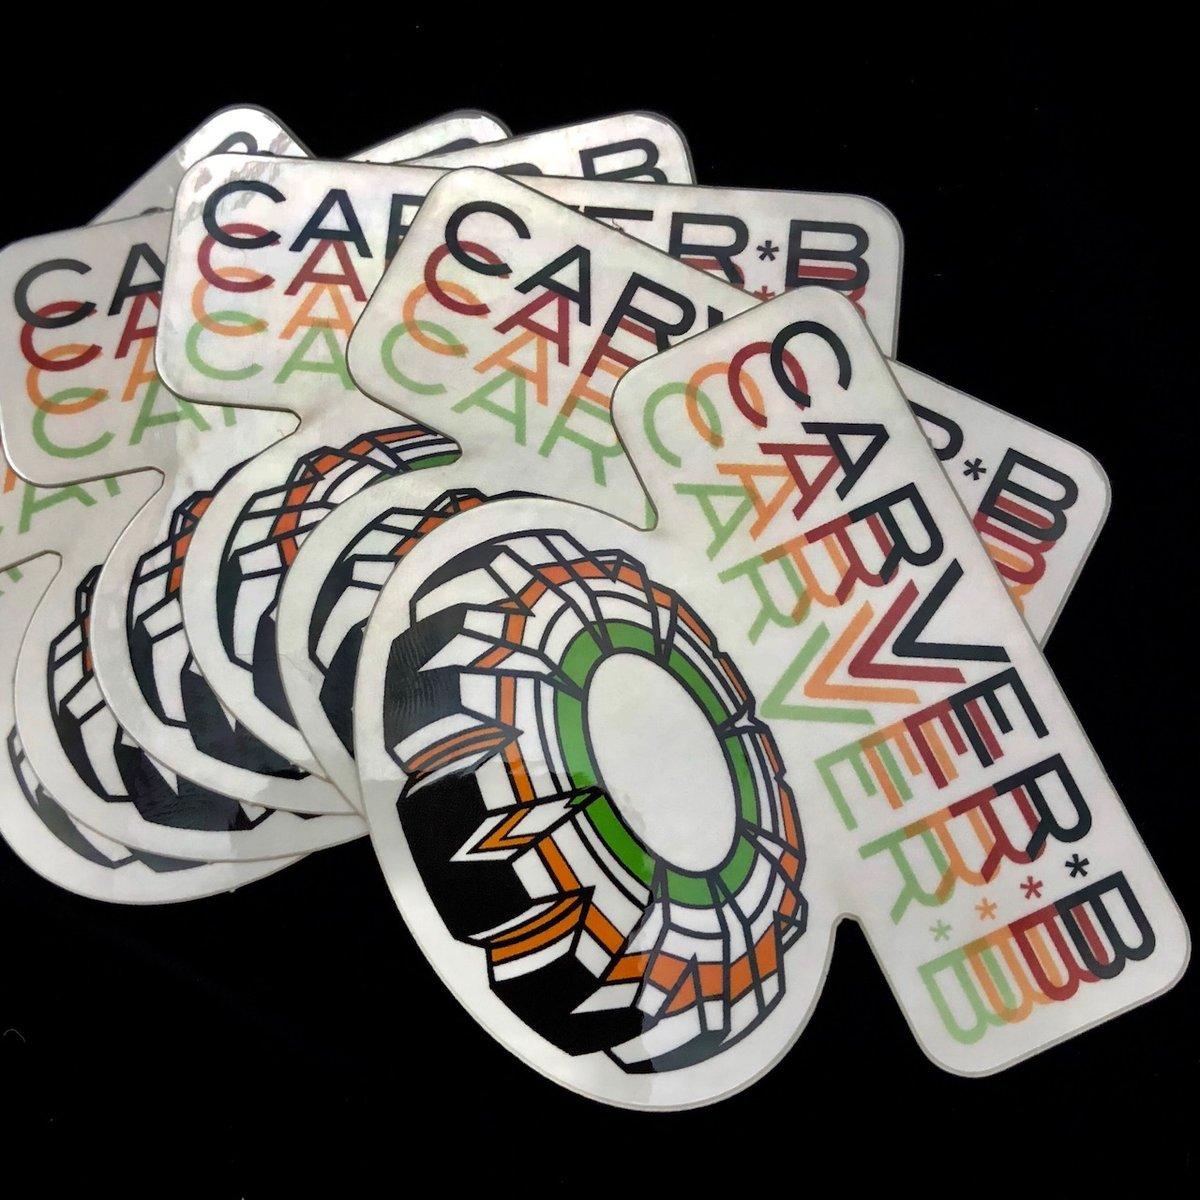 Image of Carver B Sticker/Slap